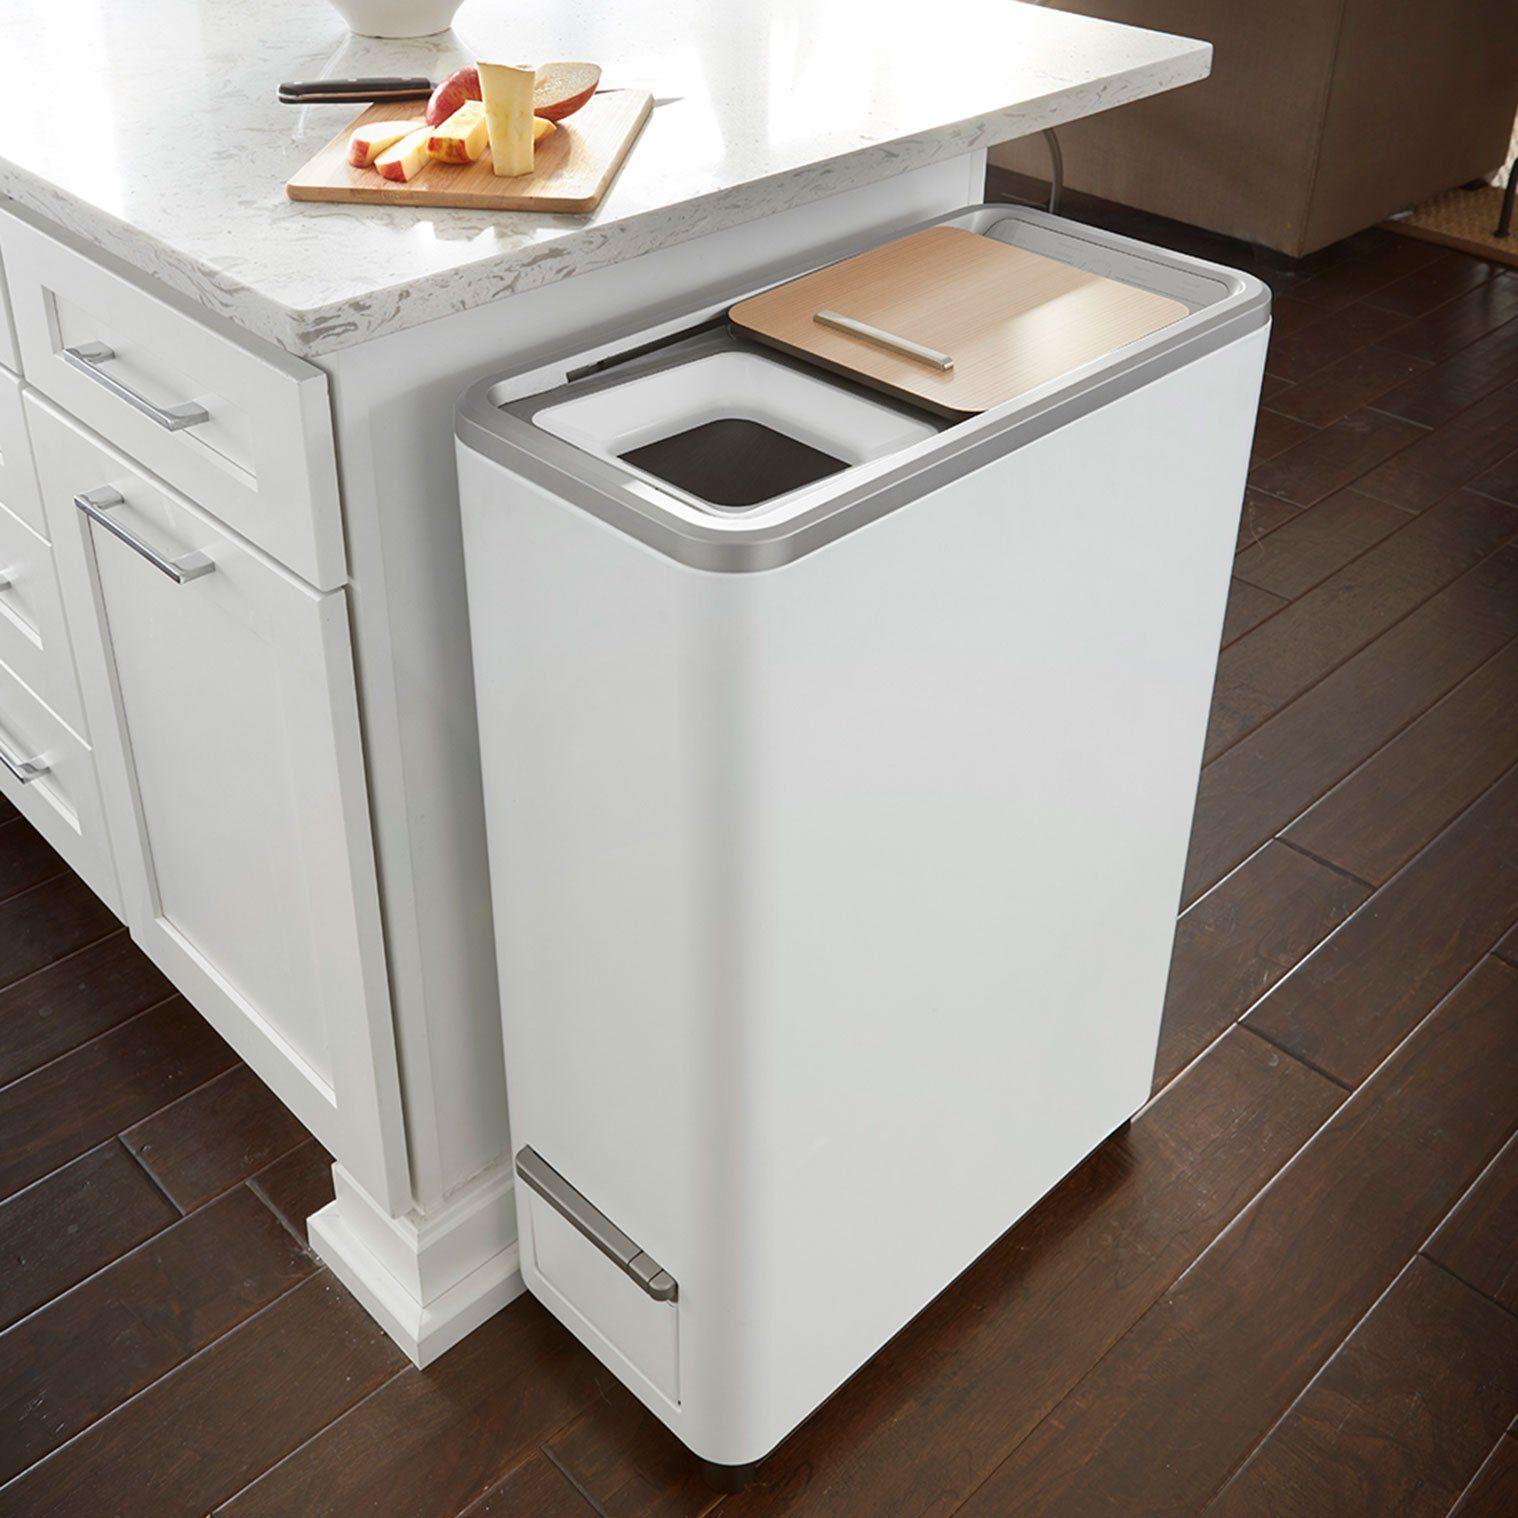 Zera Food Recycler Modern Kitchen Trash Cans Kitchen Trash Cans Modern Kitchen